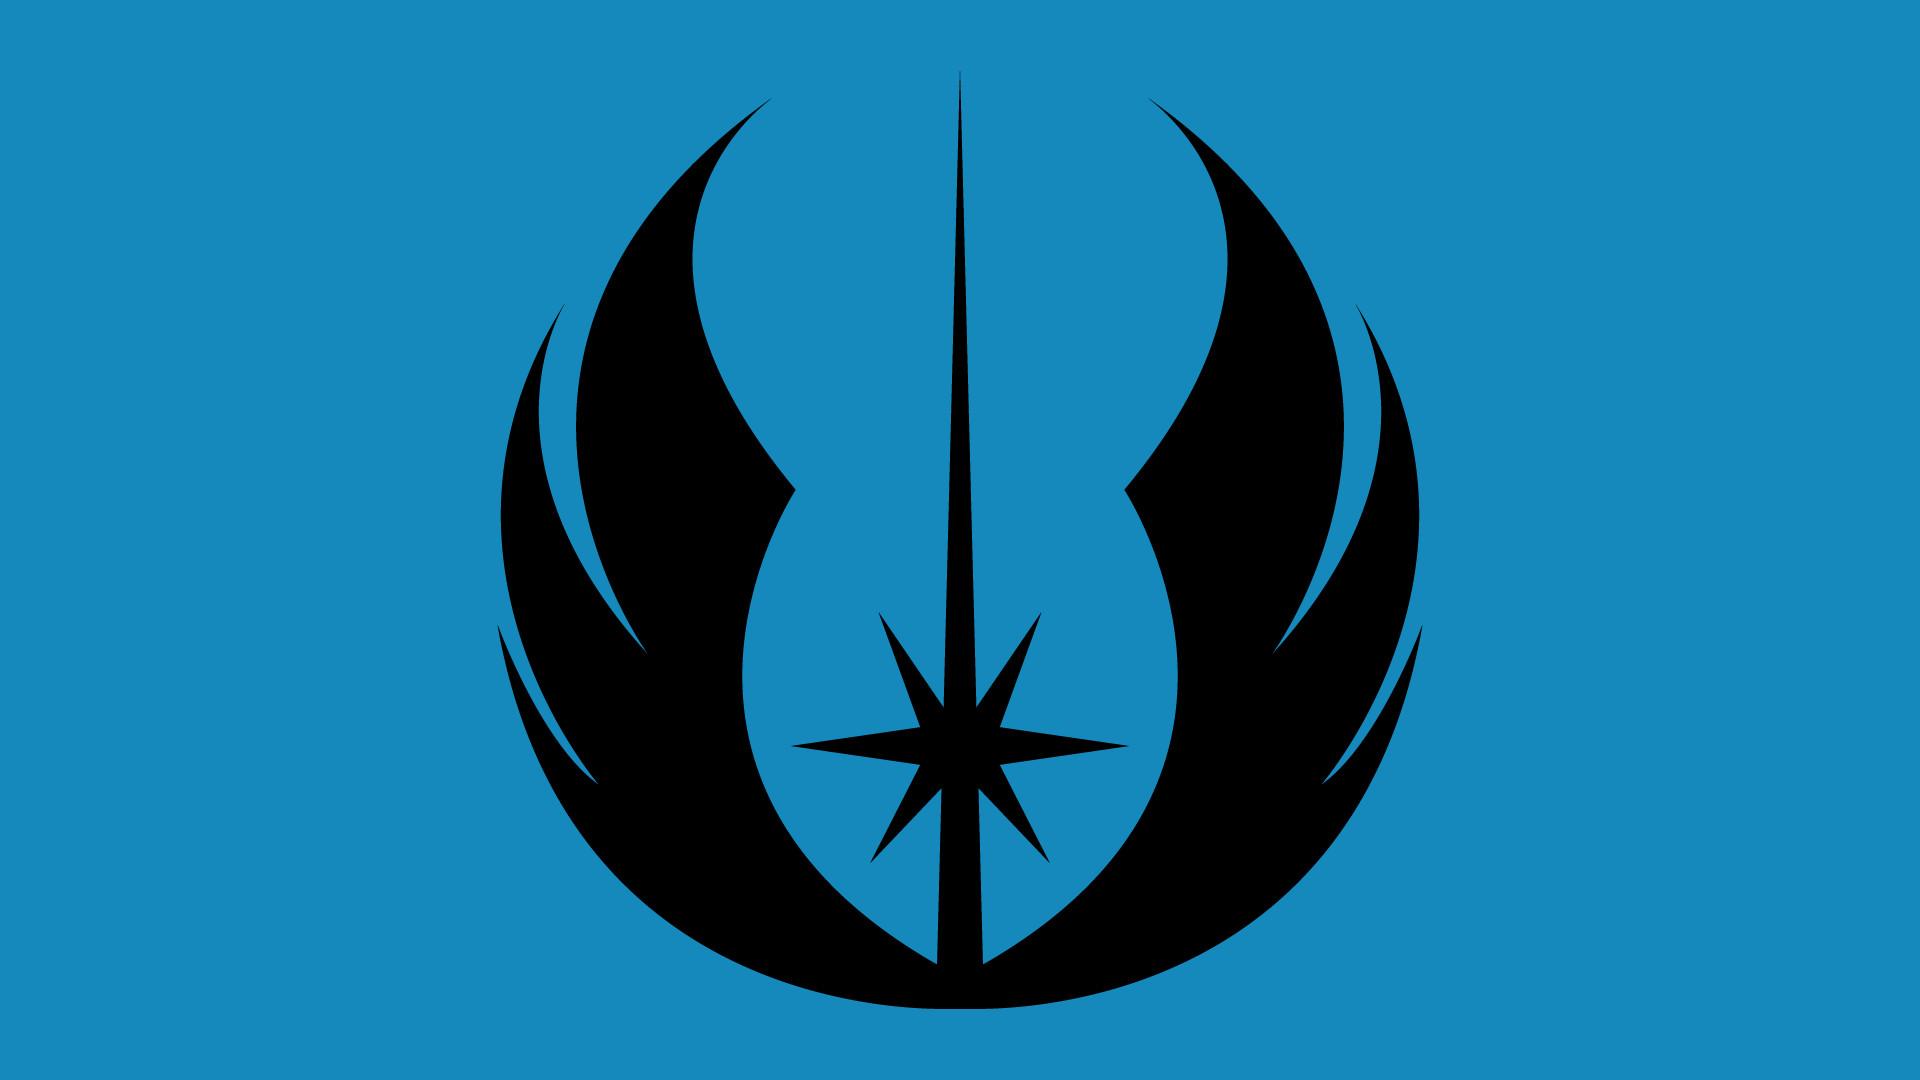 Jedi Symbol Backgrounds (Mobile, iPad)